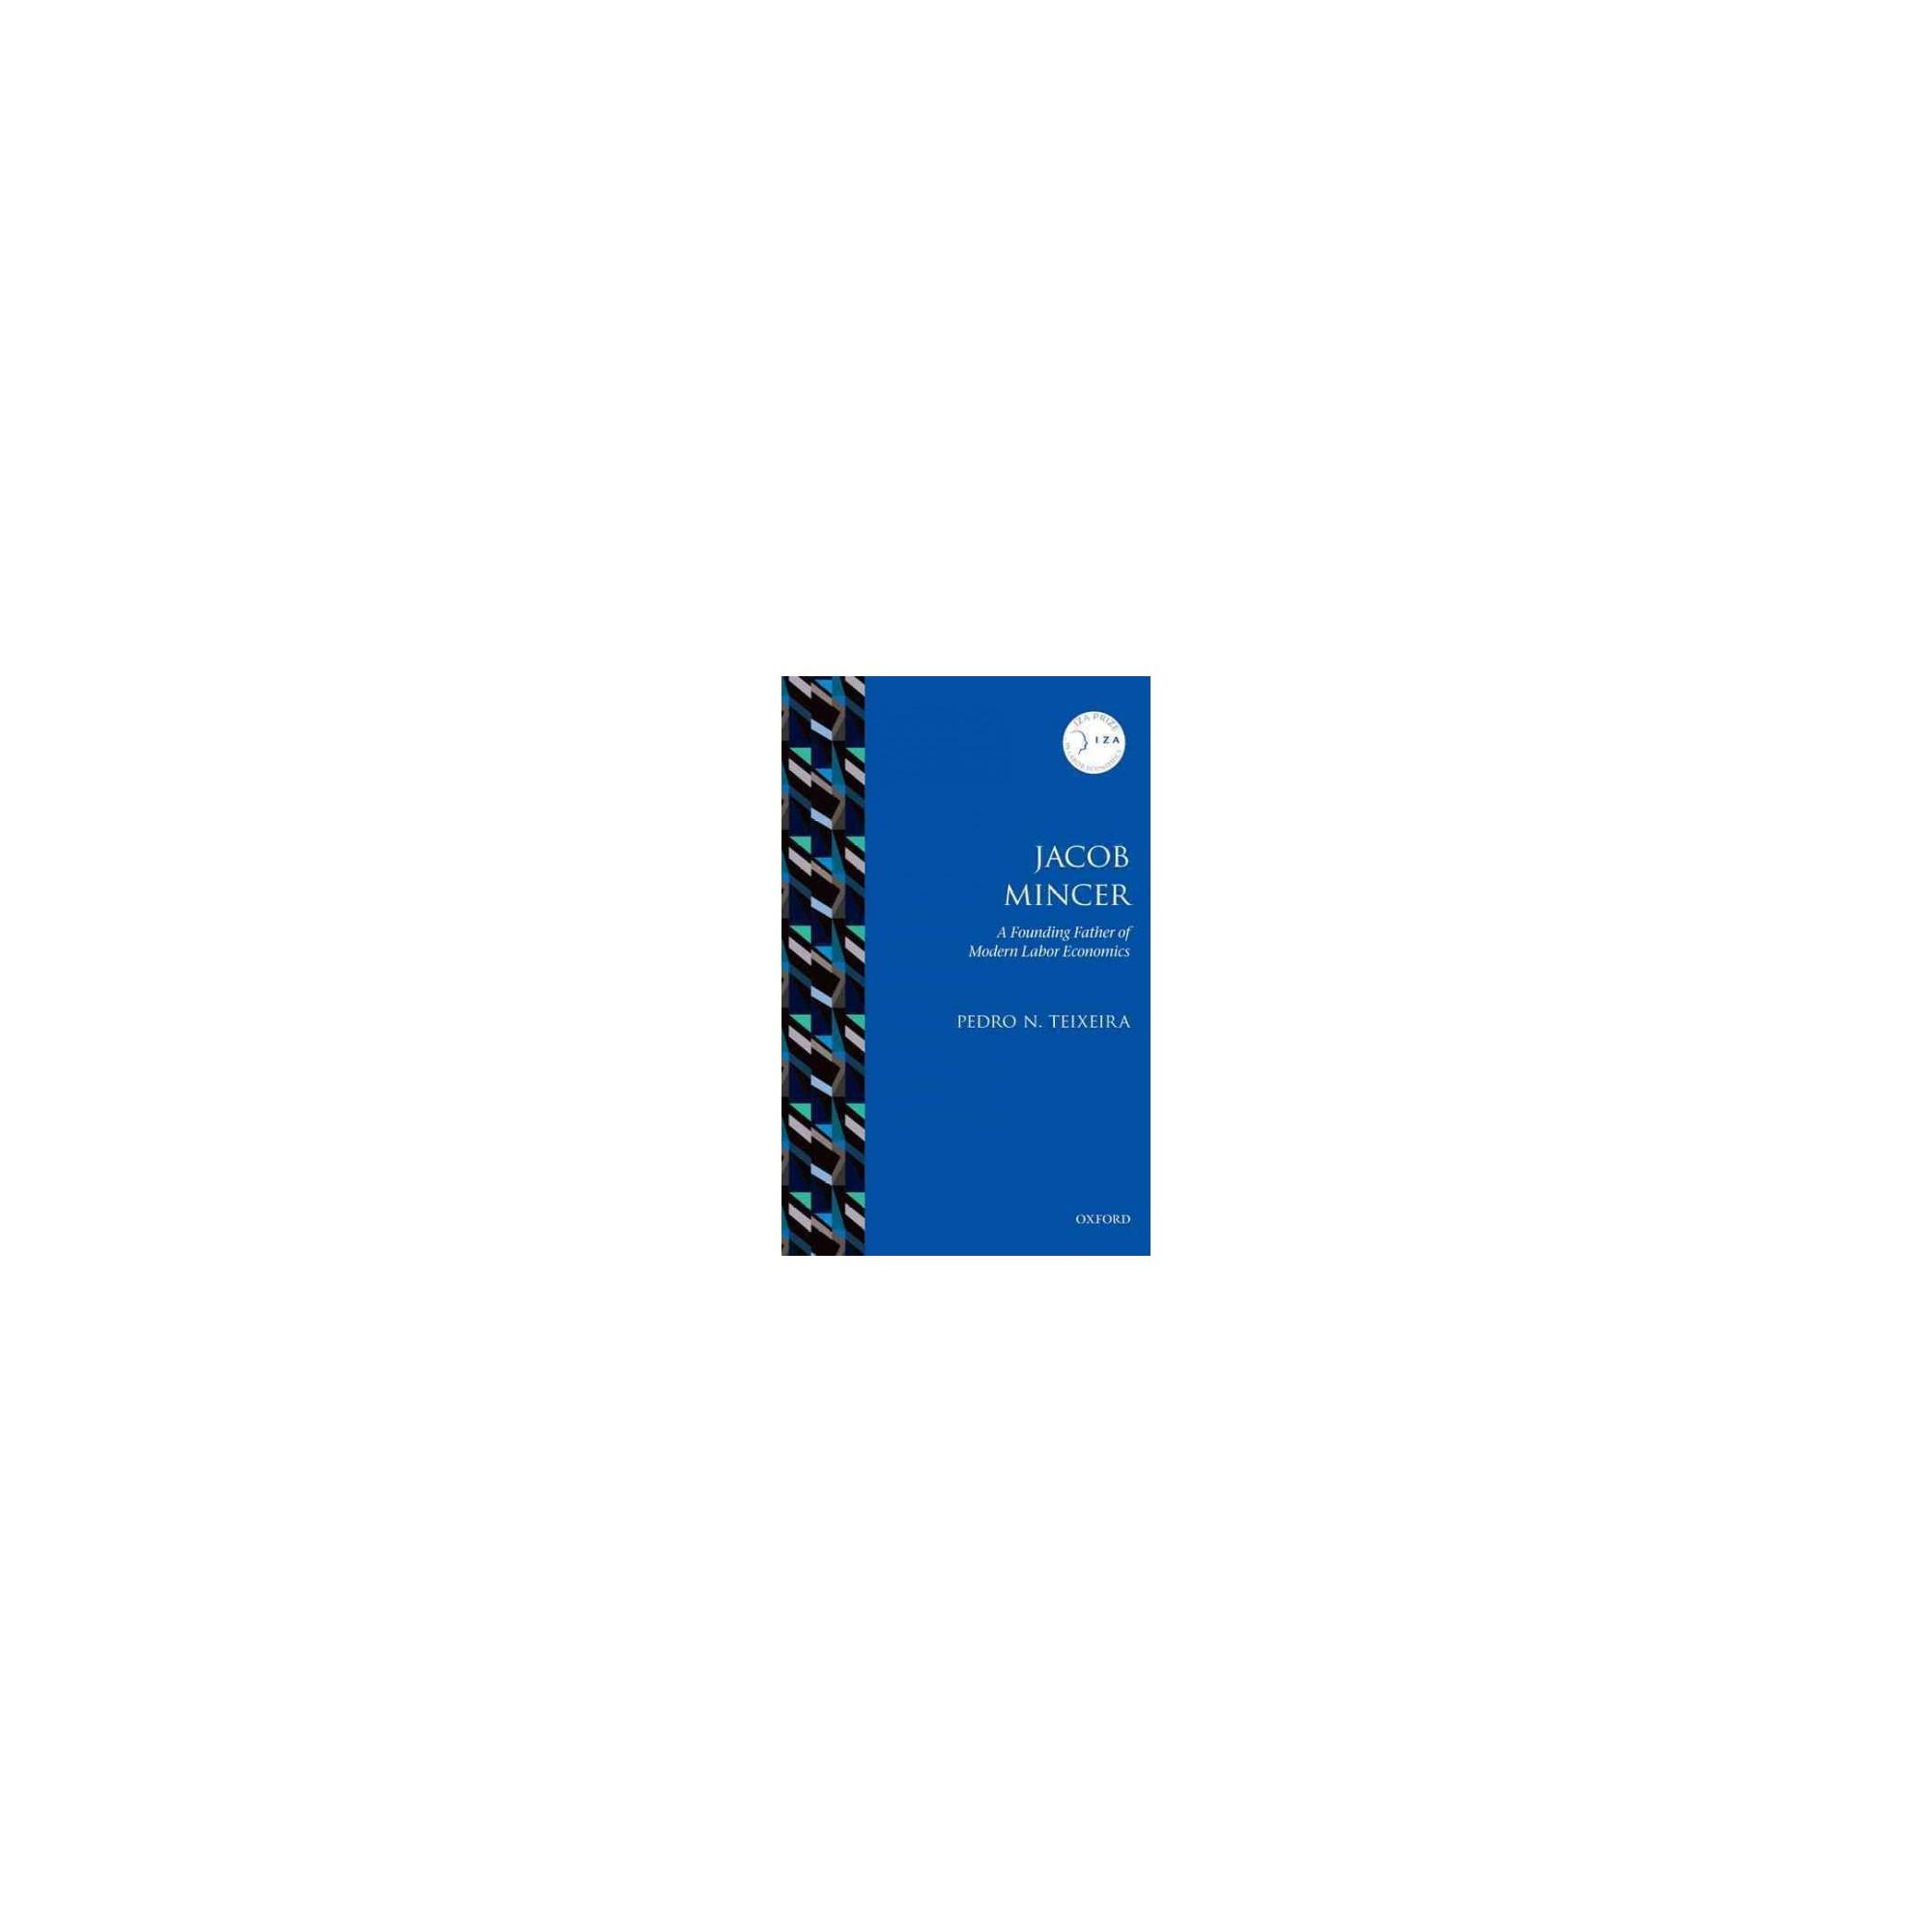 Jacob Mincer : The Founding Father of Modern Labor Economics (Reprint) (Paperback) (Pedro N. Teixeira)